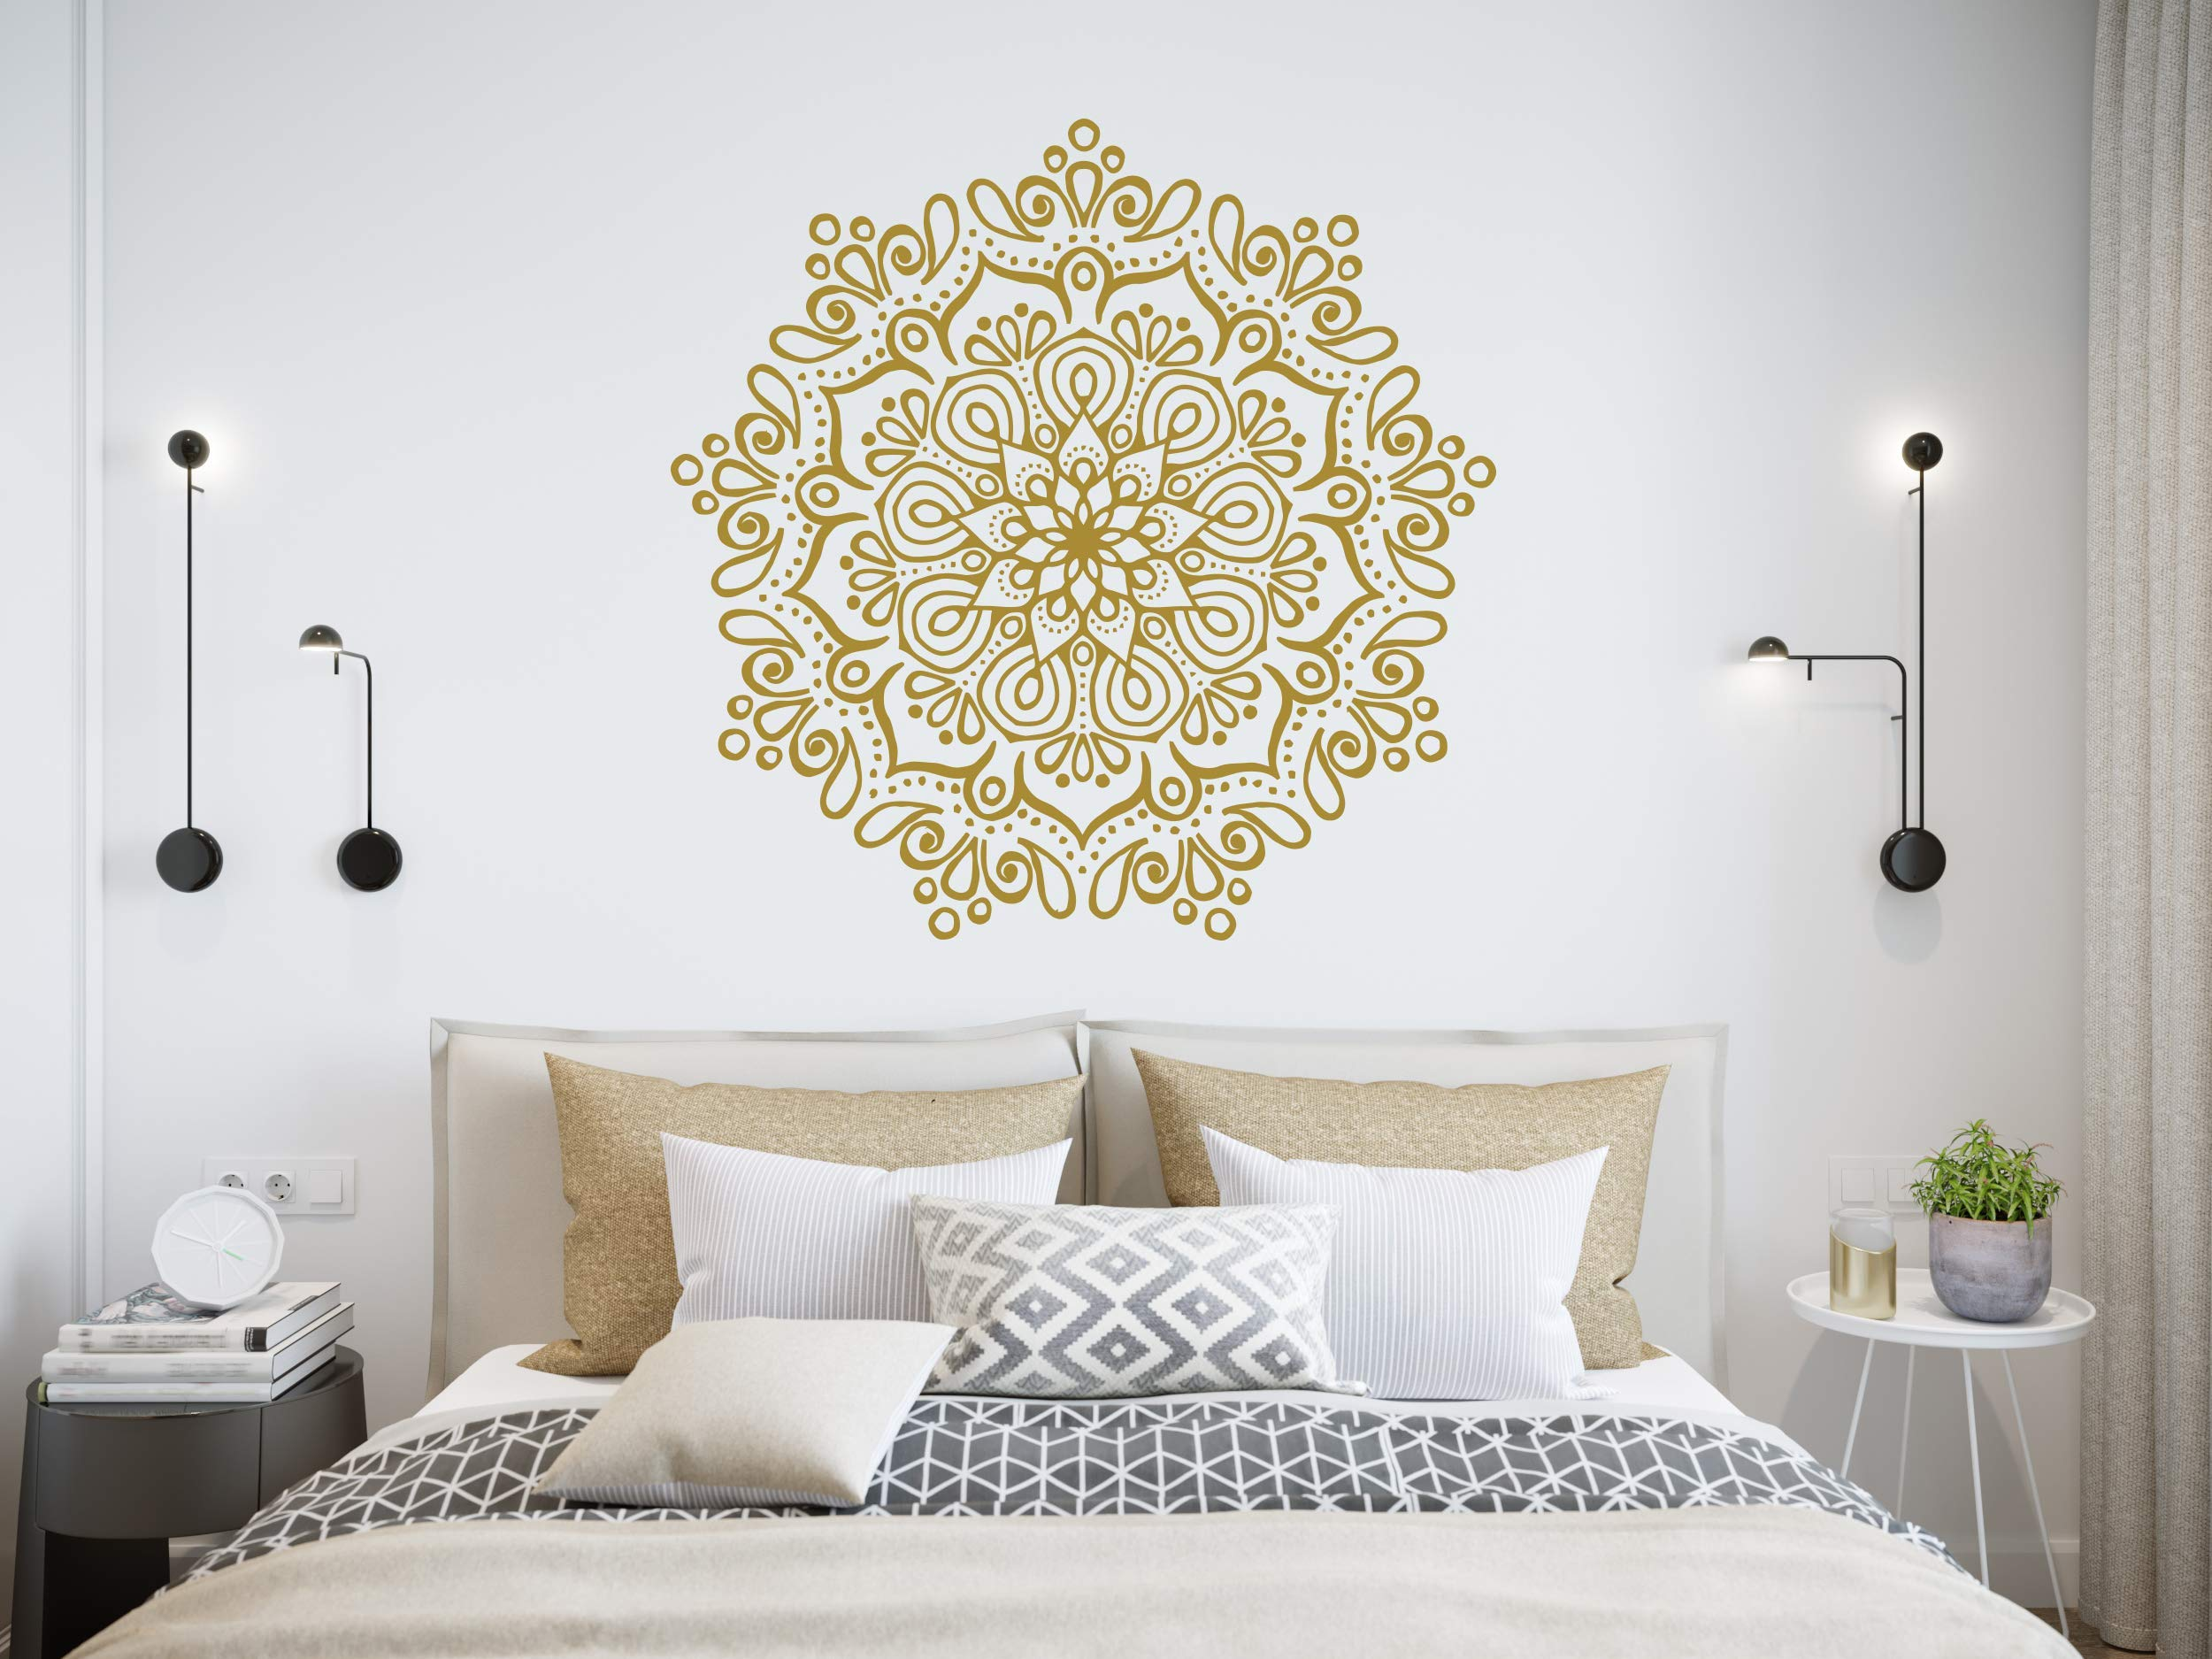 Mandala Wall Stickers | Mandala Lotus Decal | Removable vinyl decal | Made in Poland | Oracal | Wall mural | Mandala Bohemian Wall Art | C698